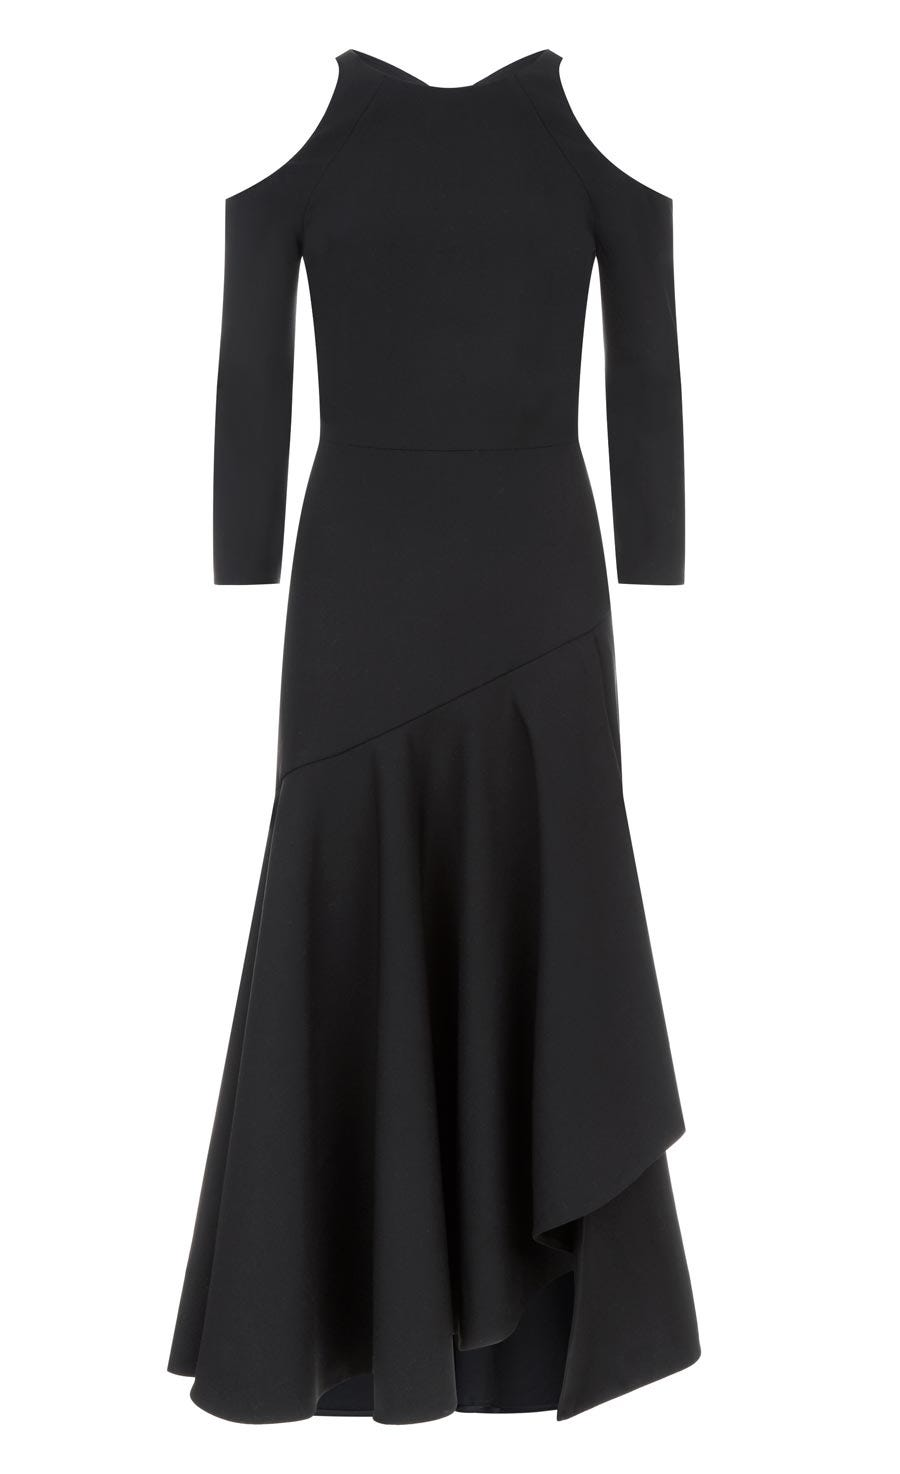 Mercury Plain Ruffle Dress, Black